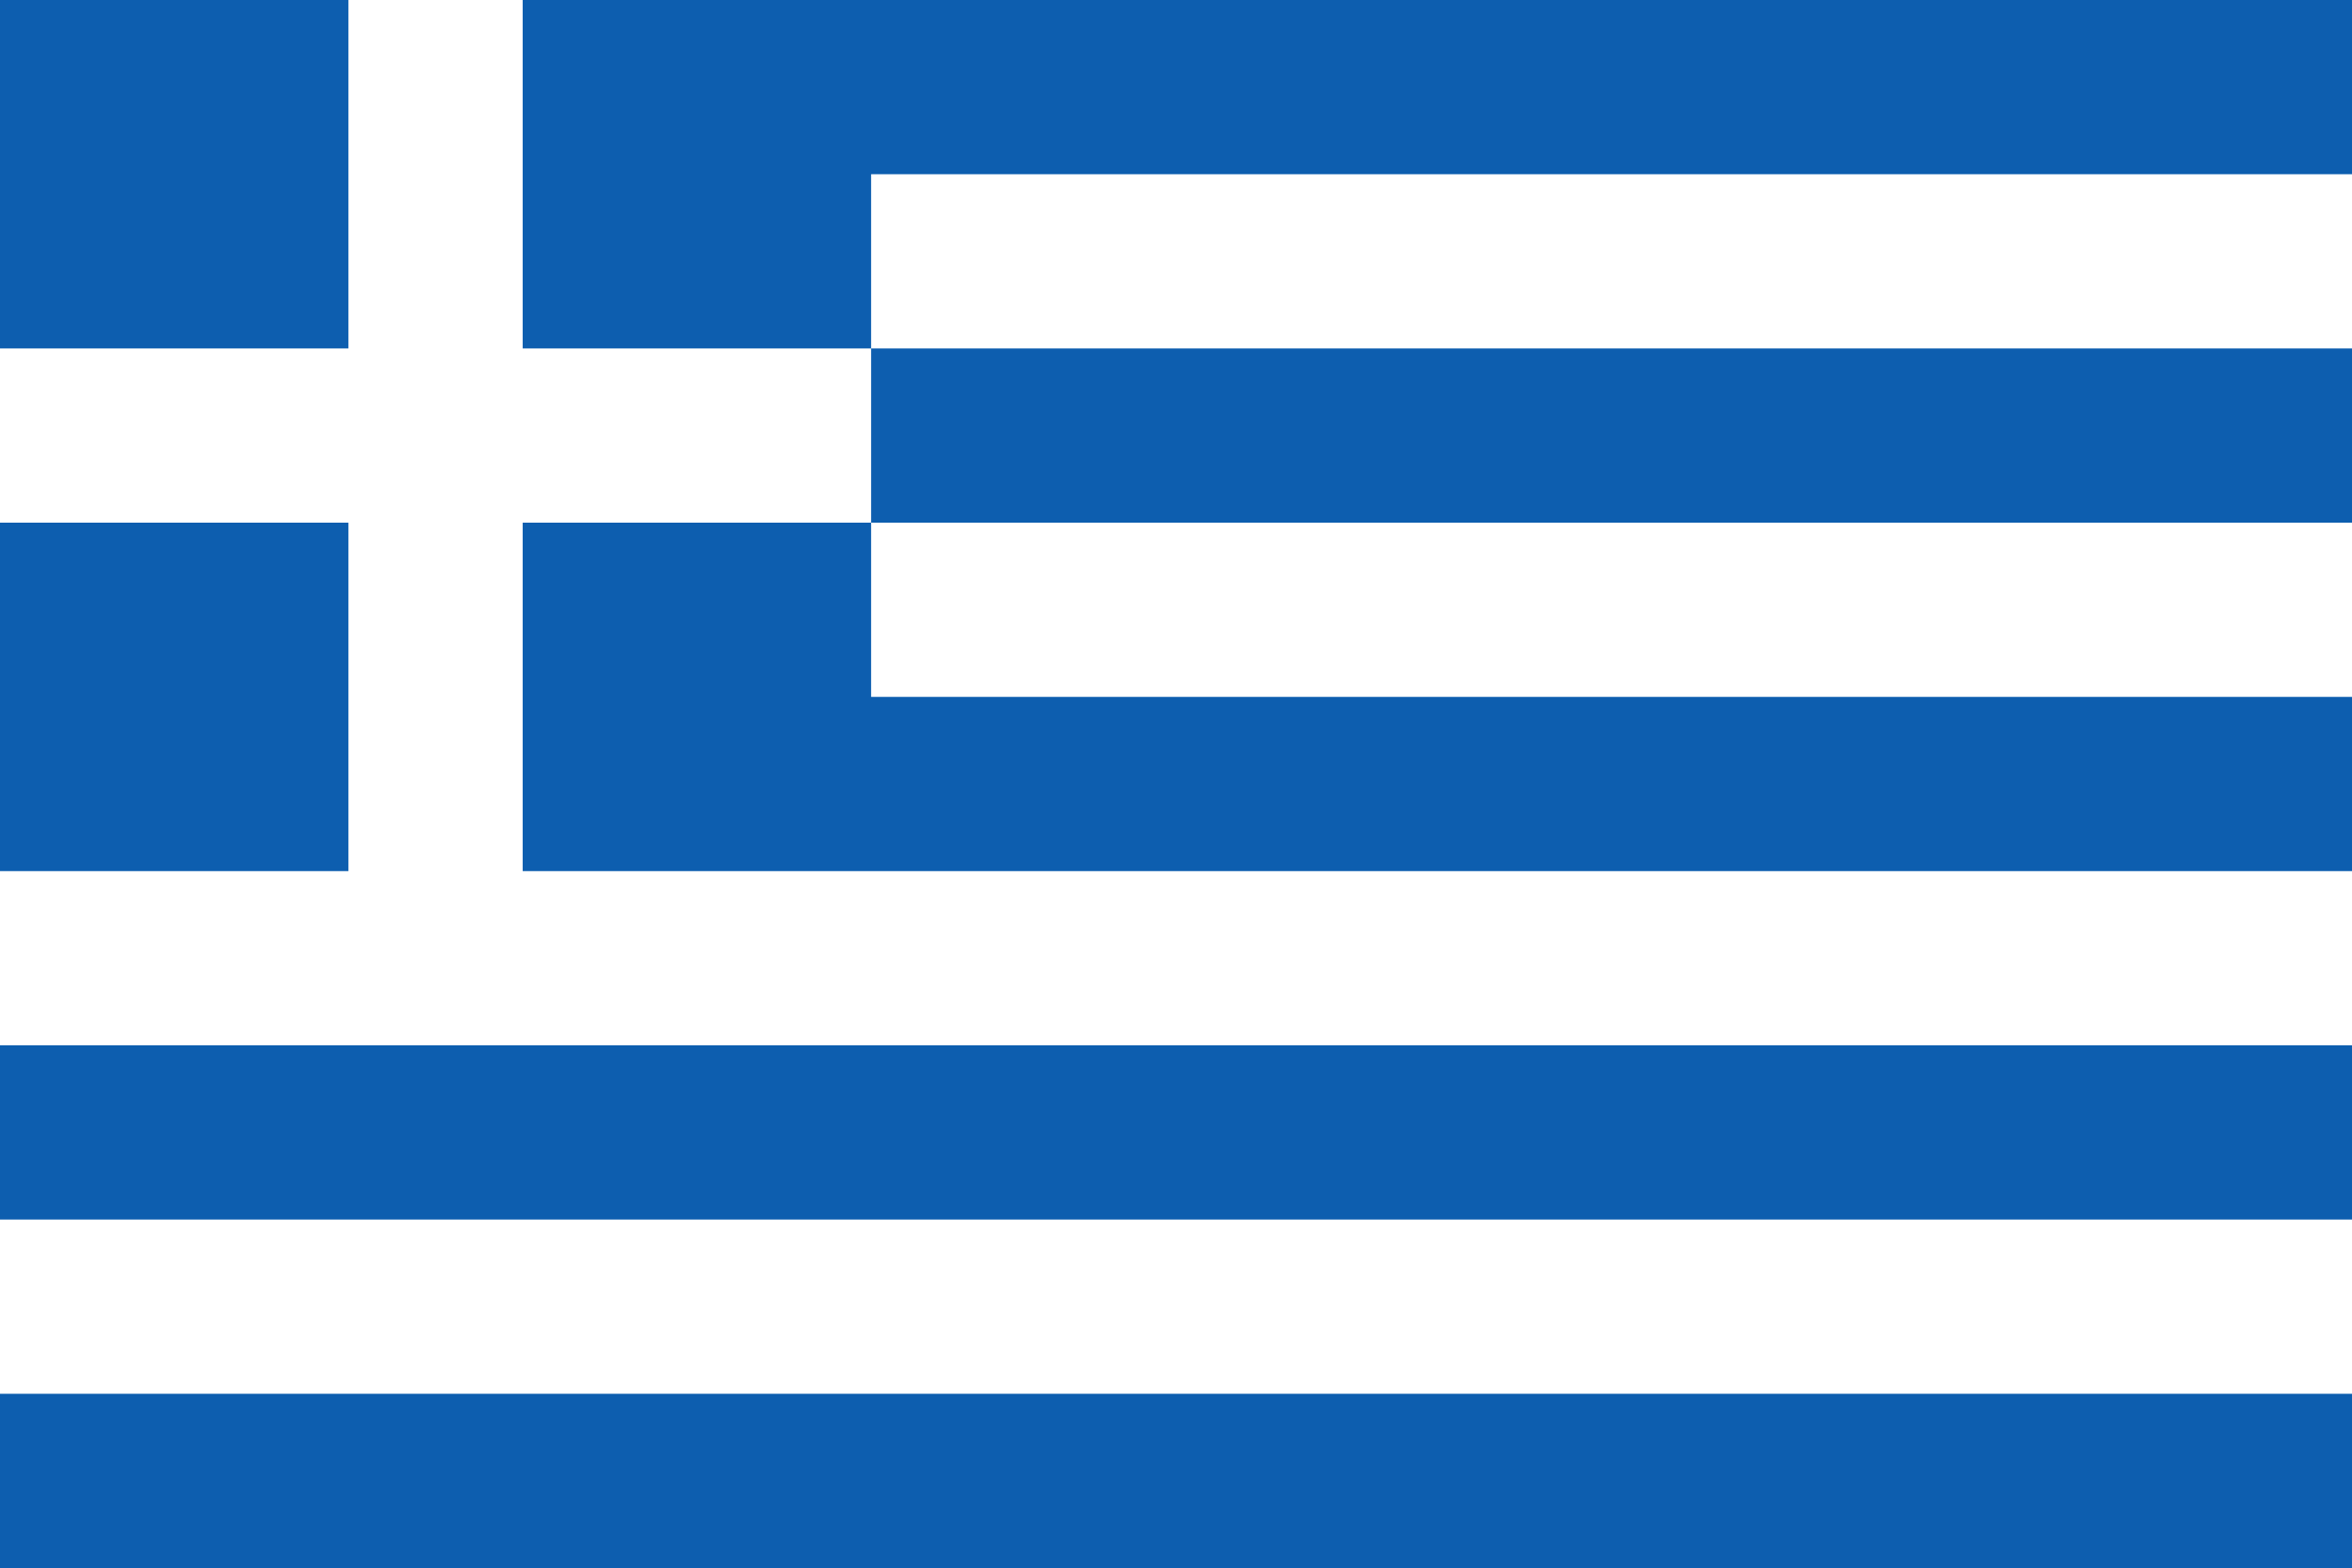 Pin On Ww2 Hellenic Resistance